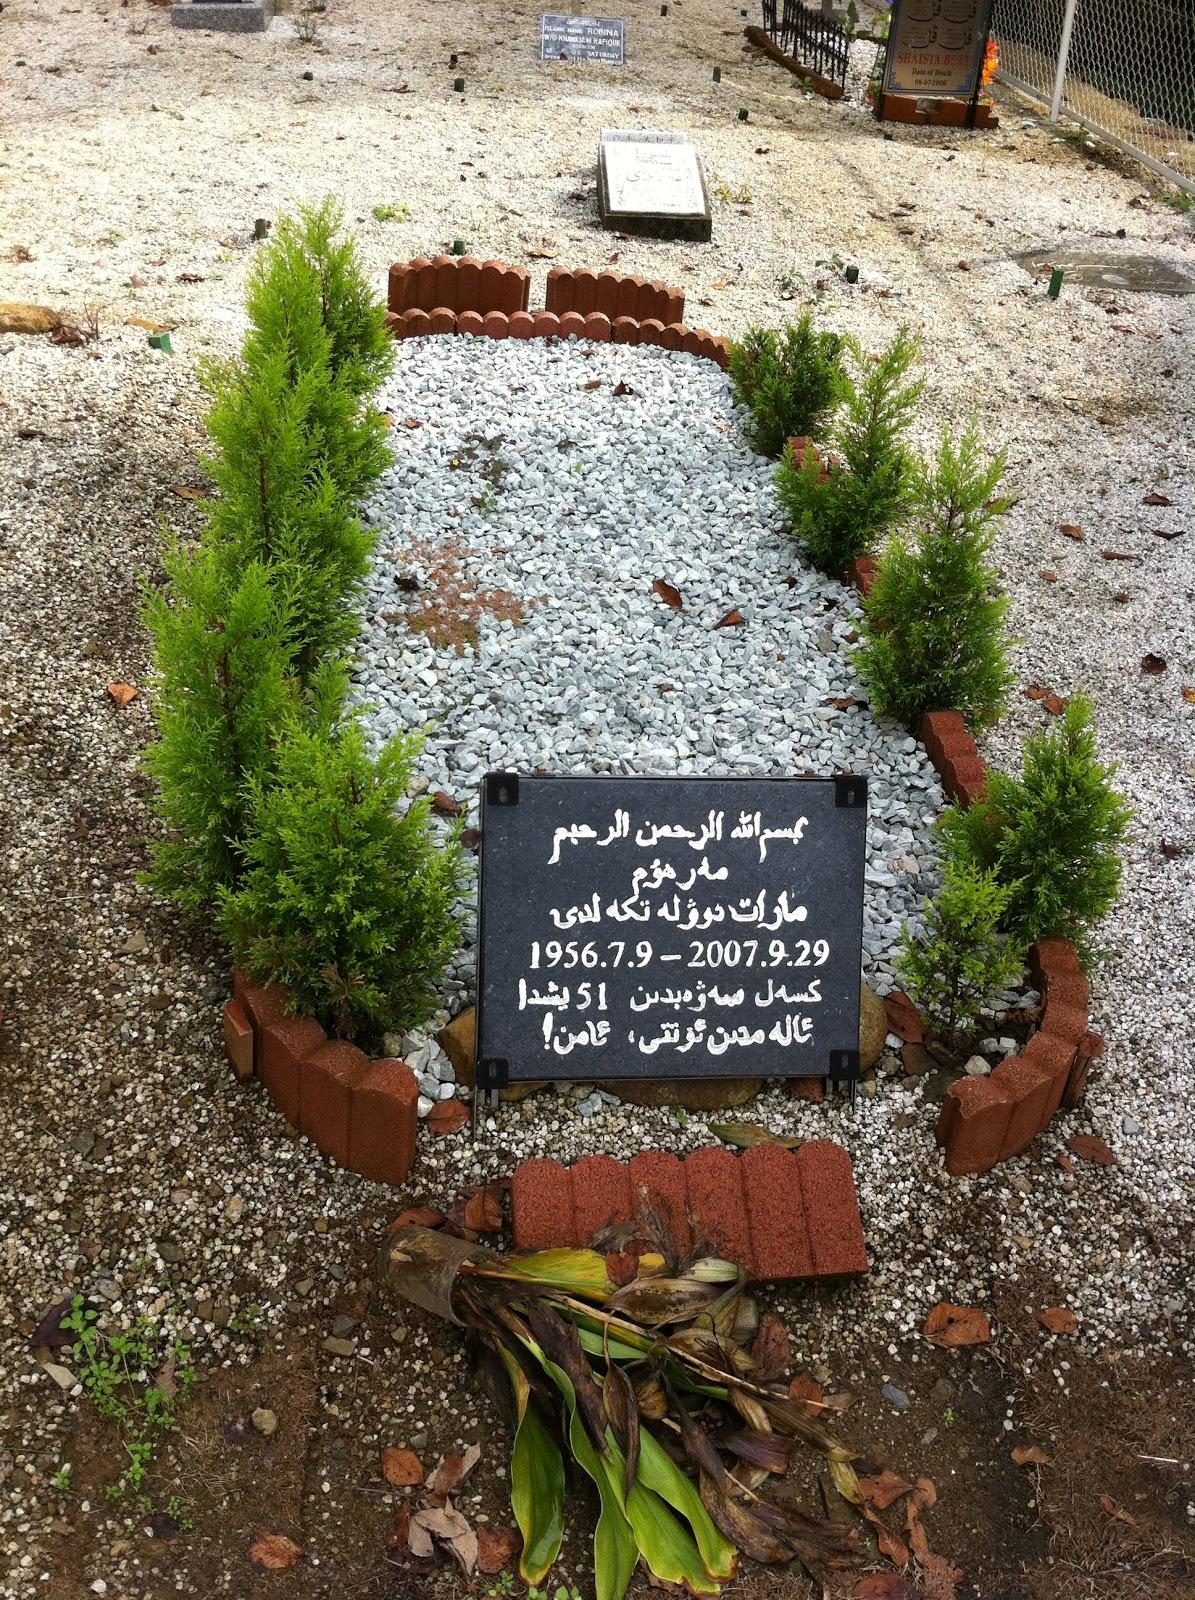 tips from indonesia hotels tentang doa ziarah kubur orang orang